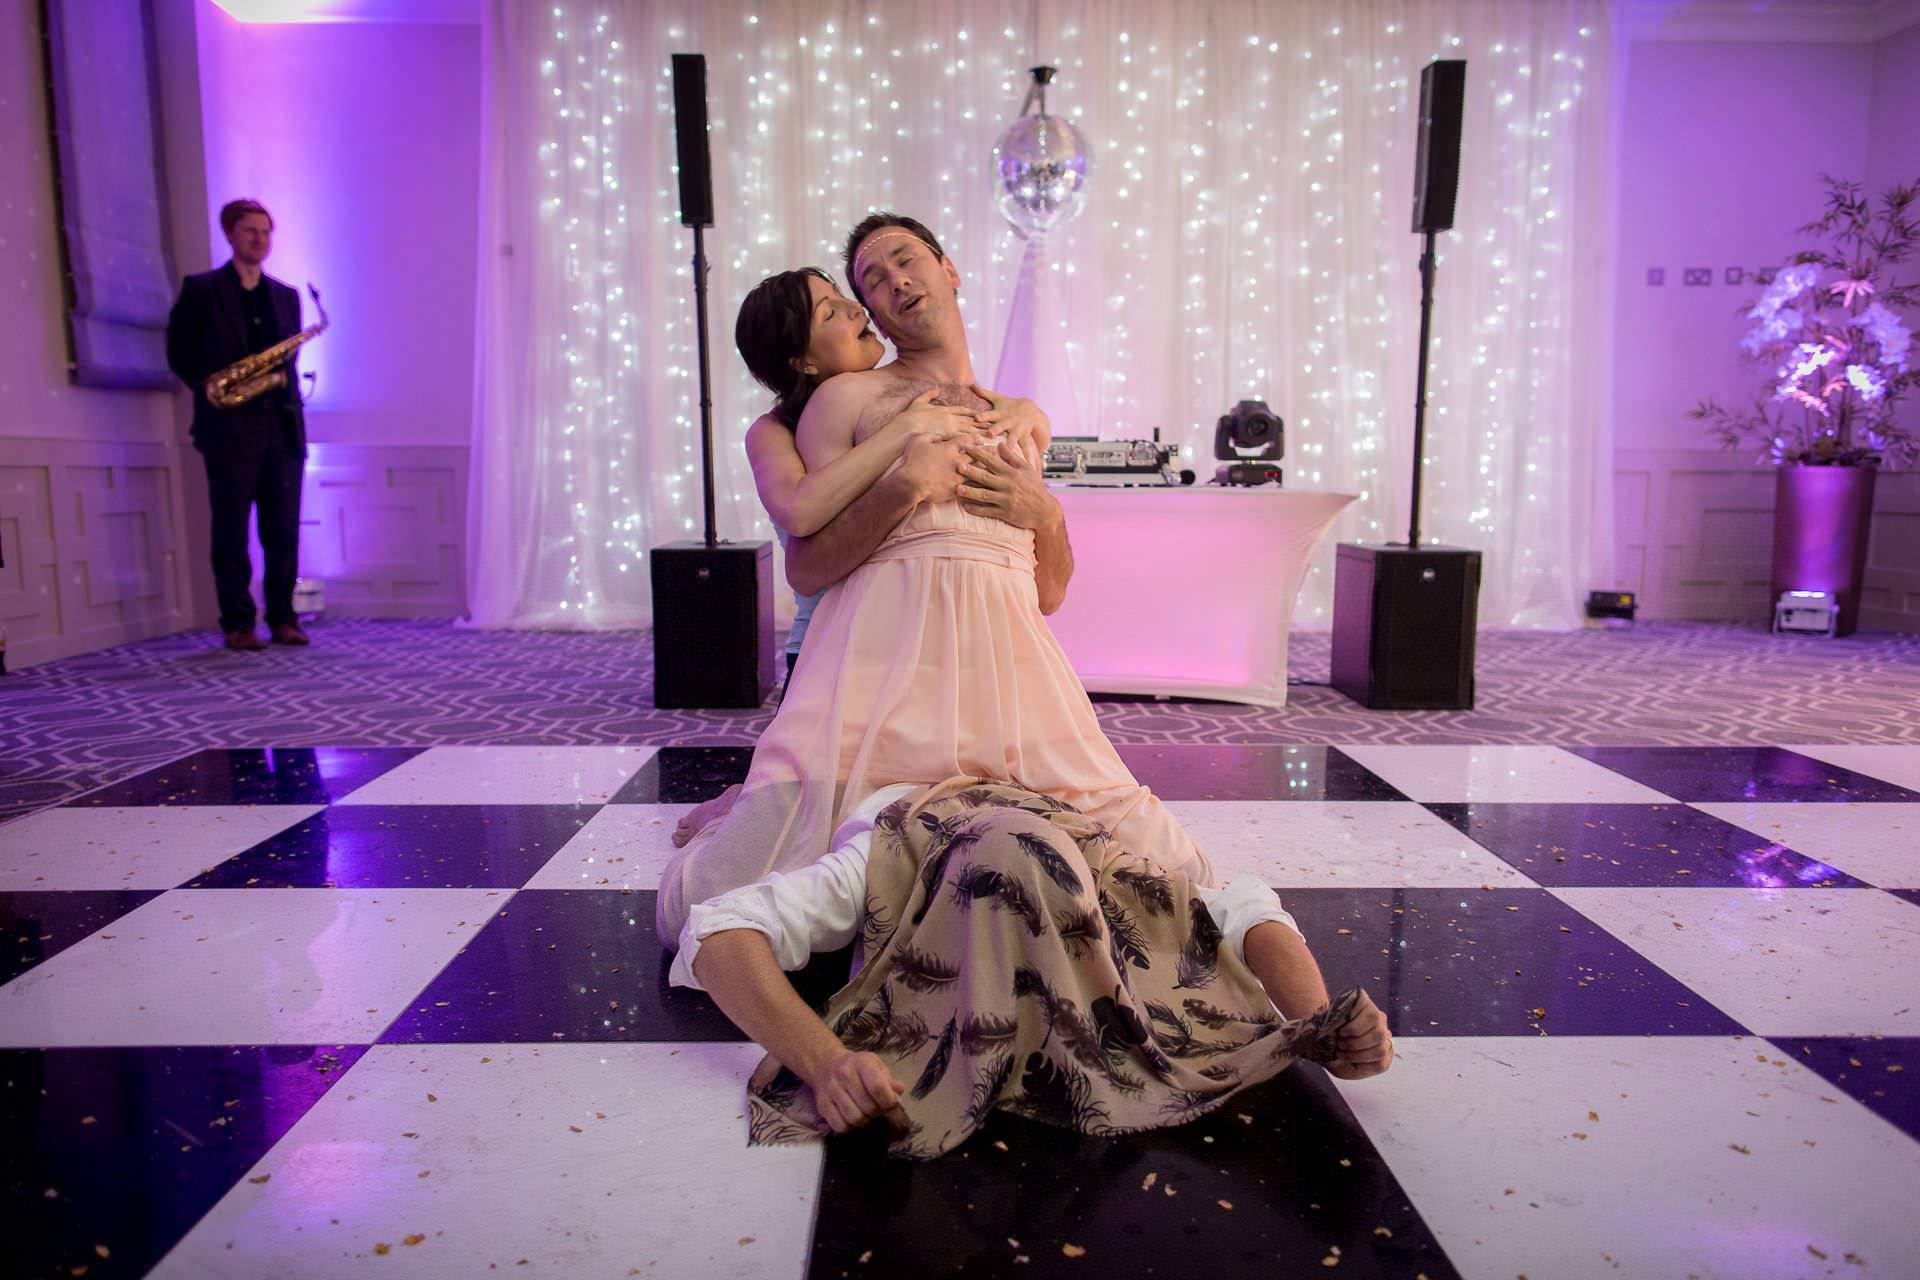 Wotton House wedding performance